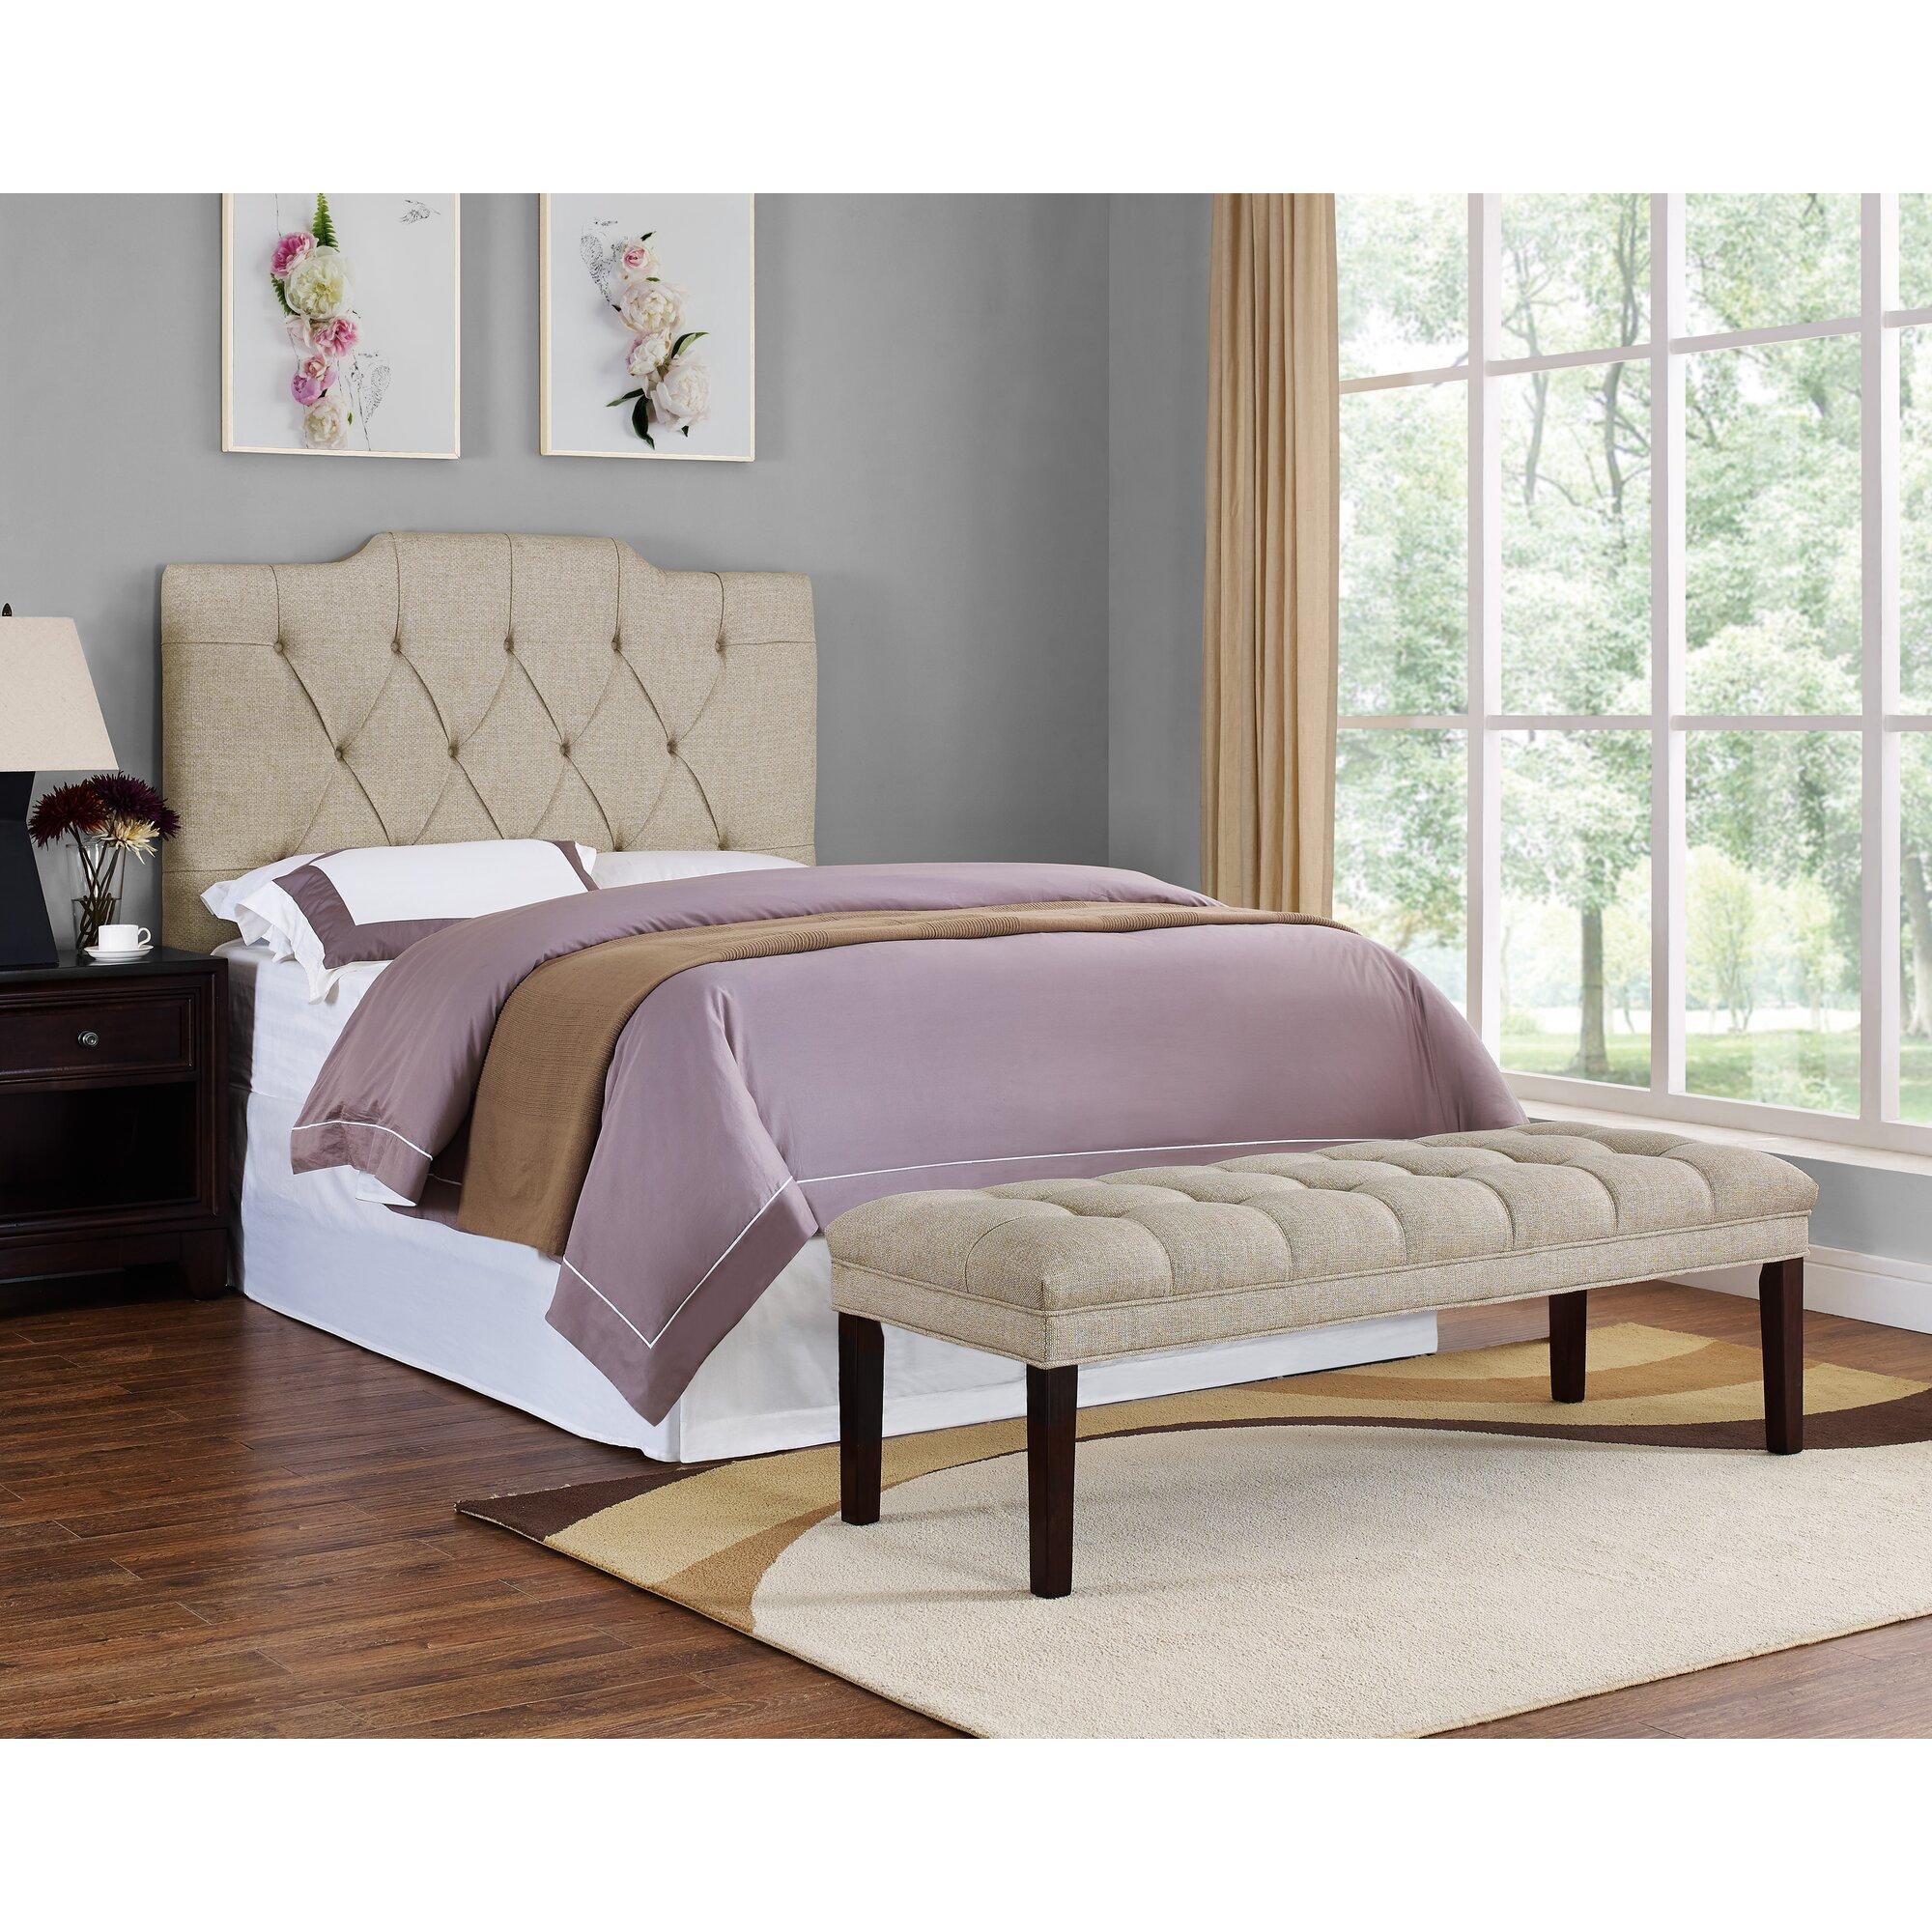 PRI Upholstered Tufted Bedroom Bench & Reviews | Wayfair